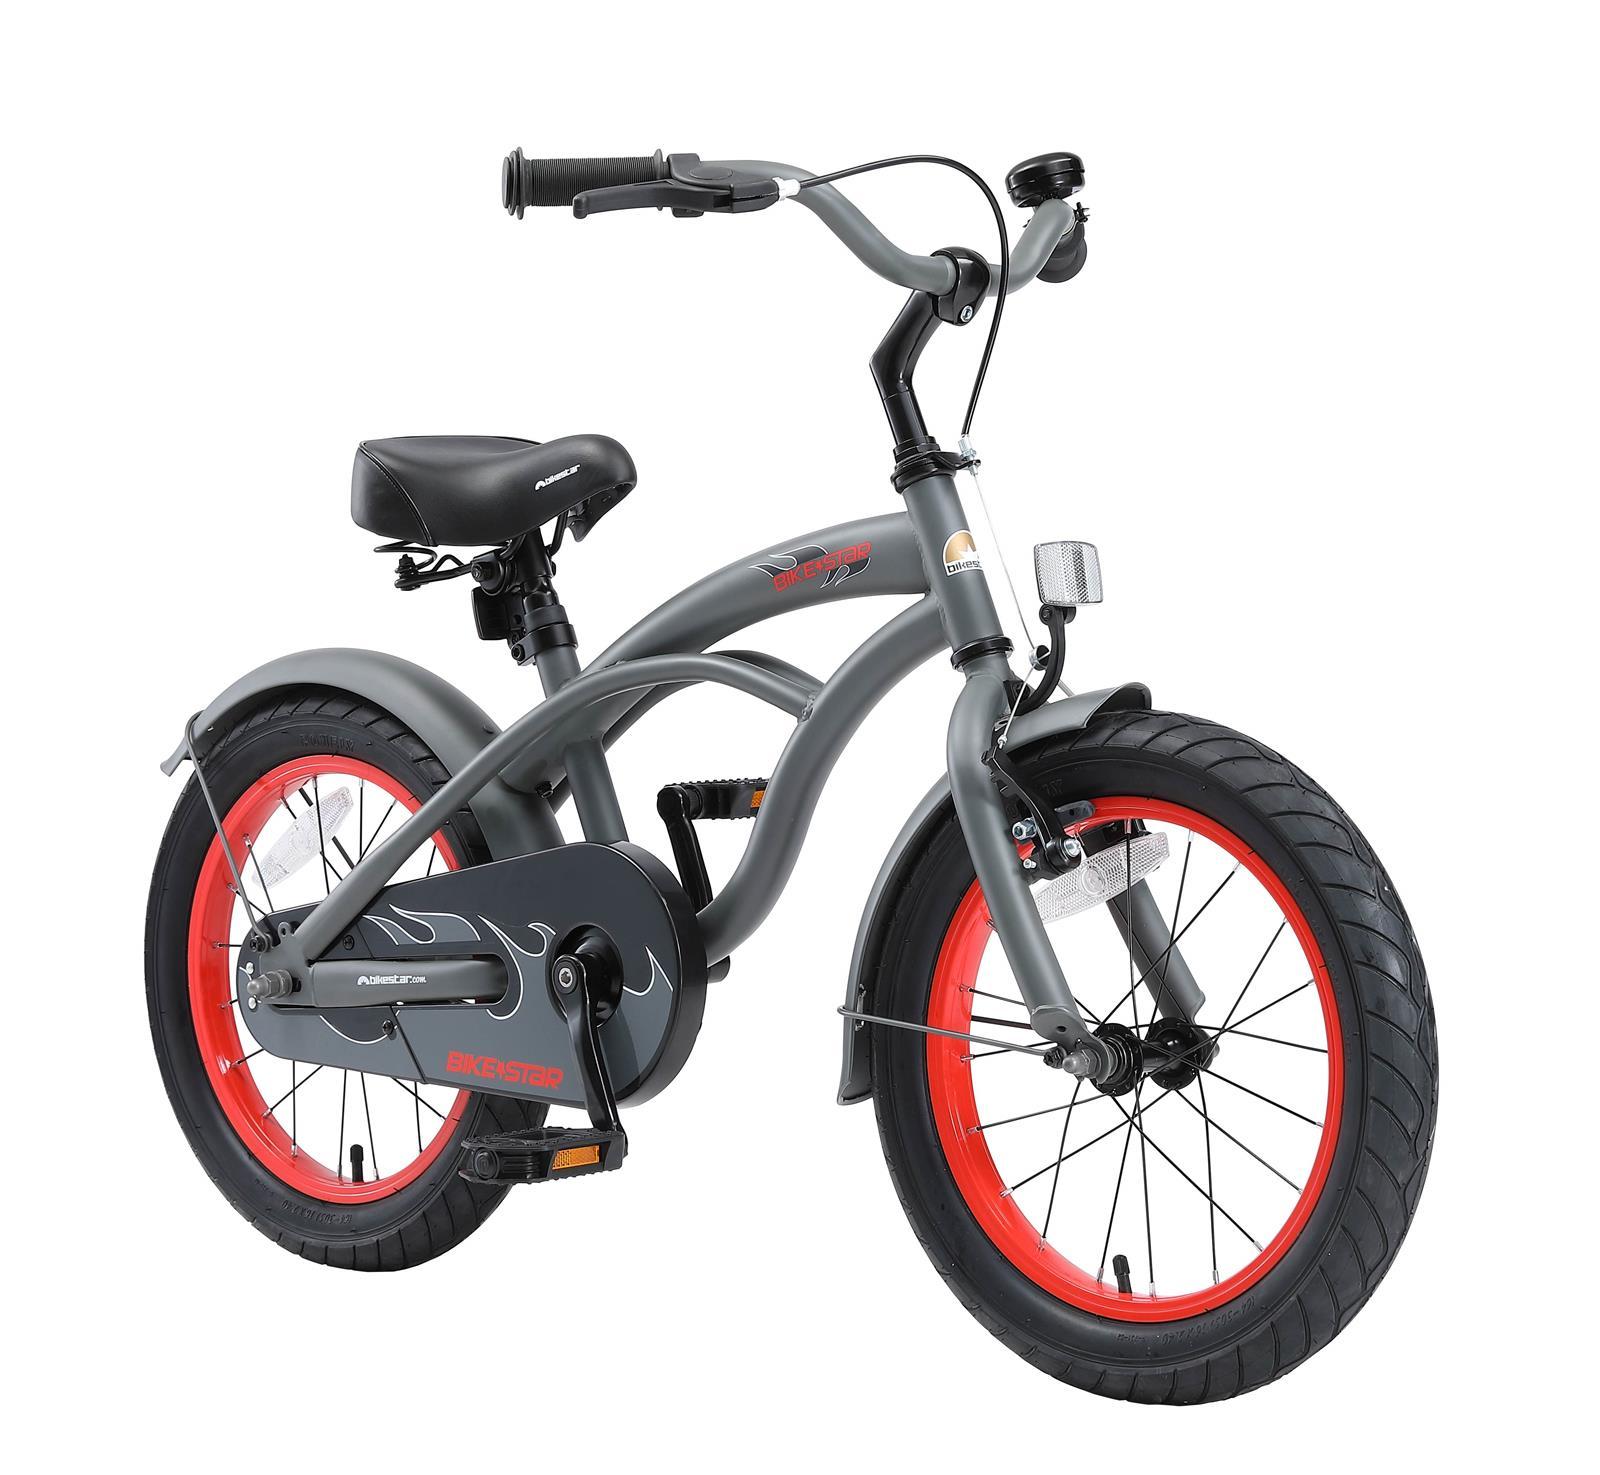 bi 16 cr 02 gree bikestar 16 zoll kindercruiser gruen. Black Bedroom Furniture Sets. Home Design Ideas